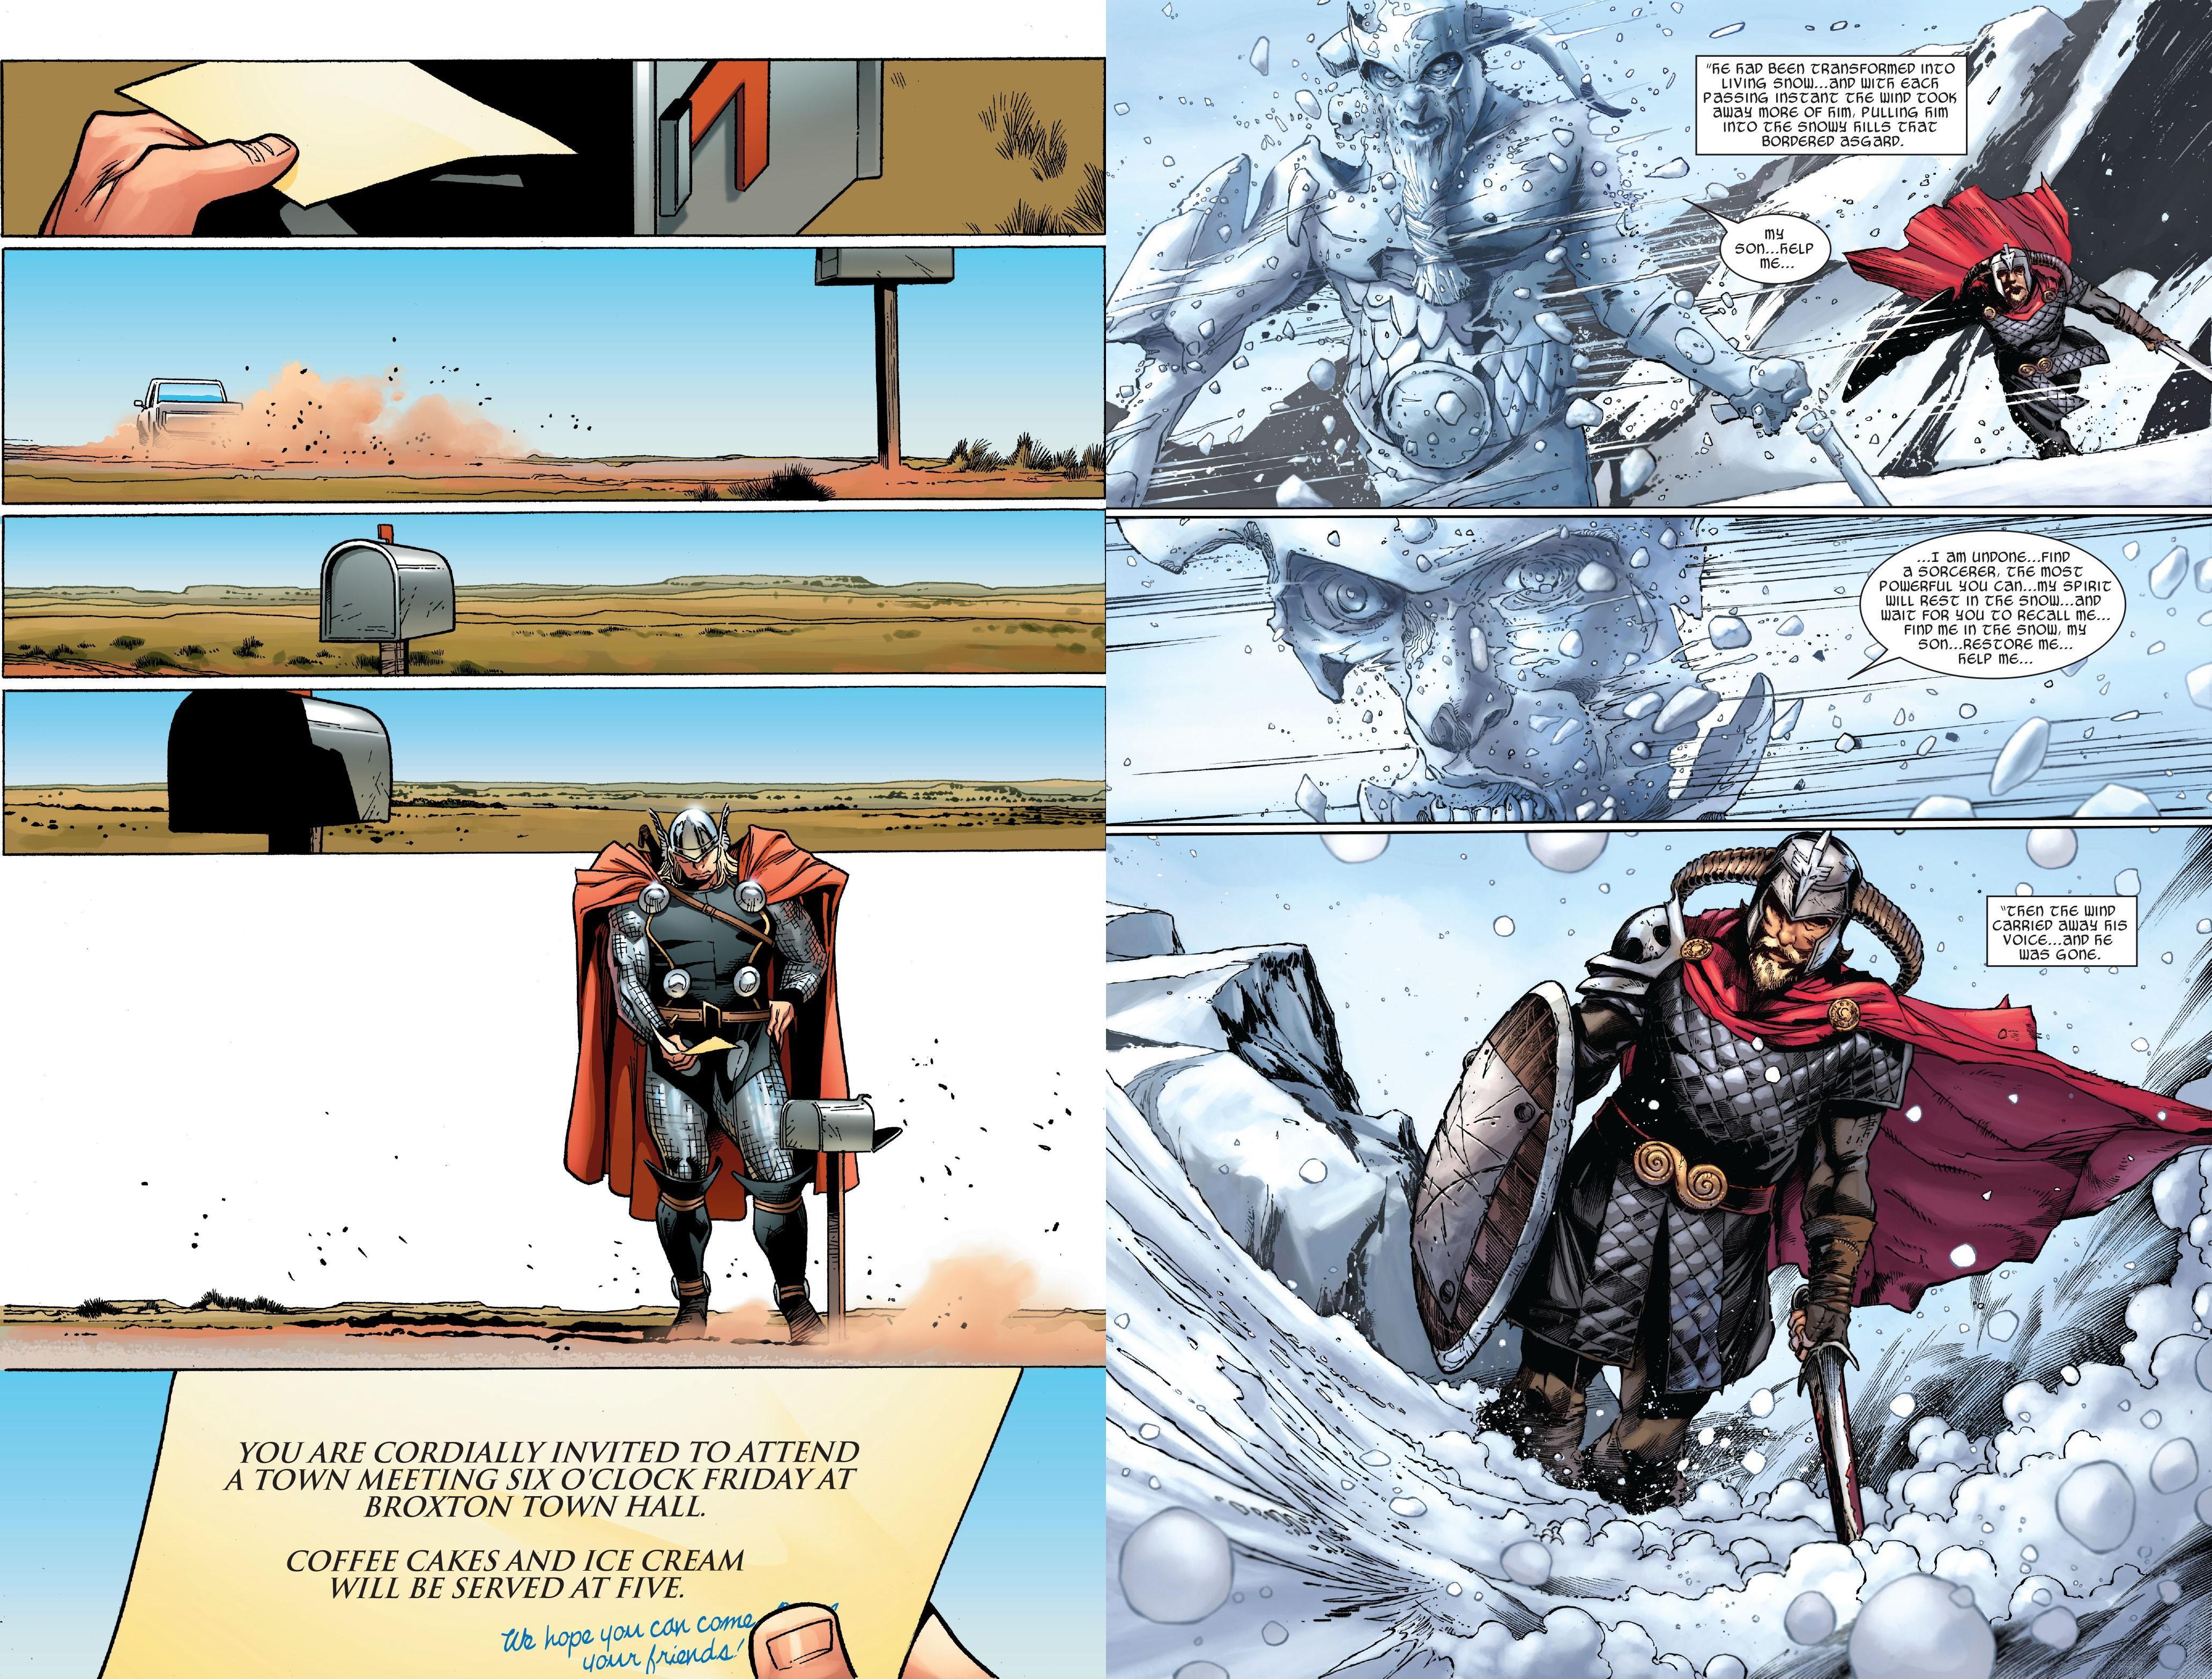 Thor by J. Michael Straczynski Omnibus review